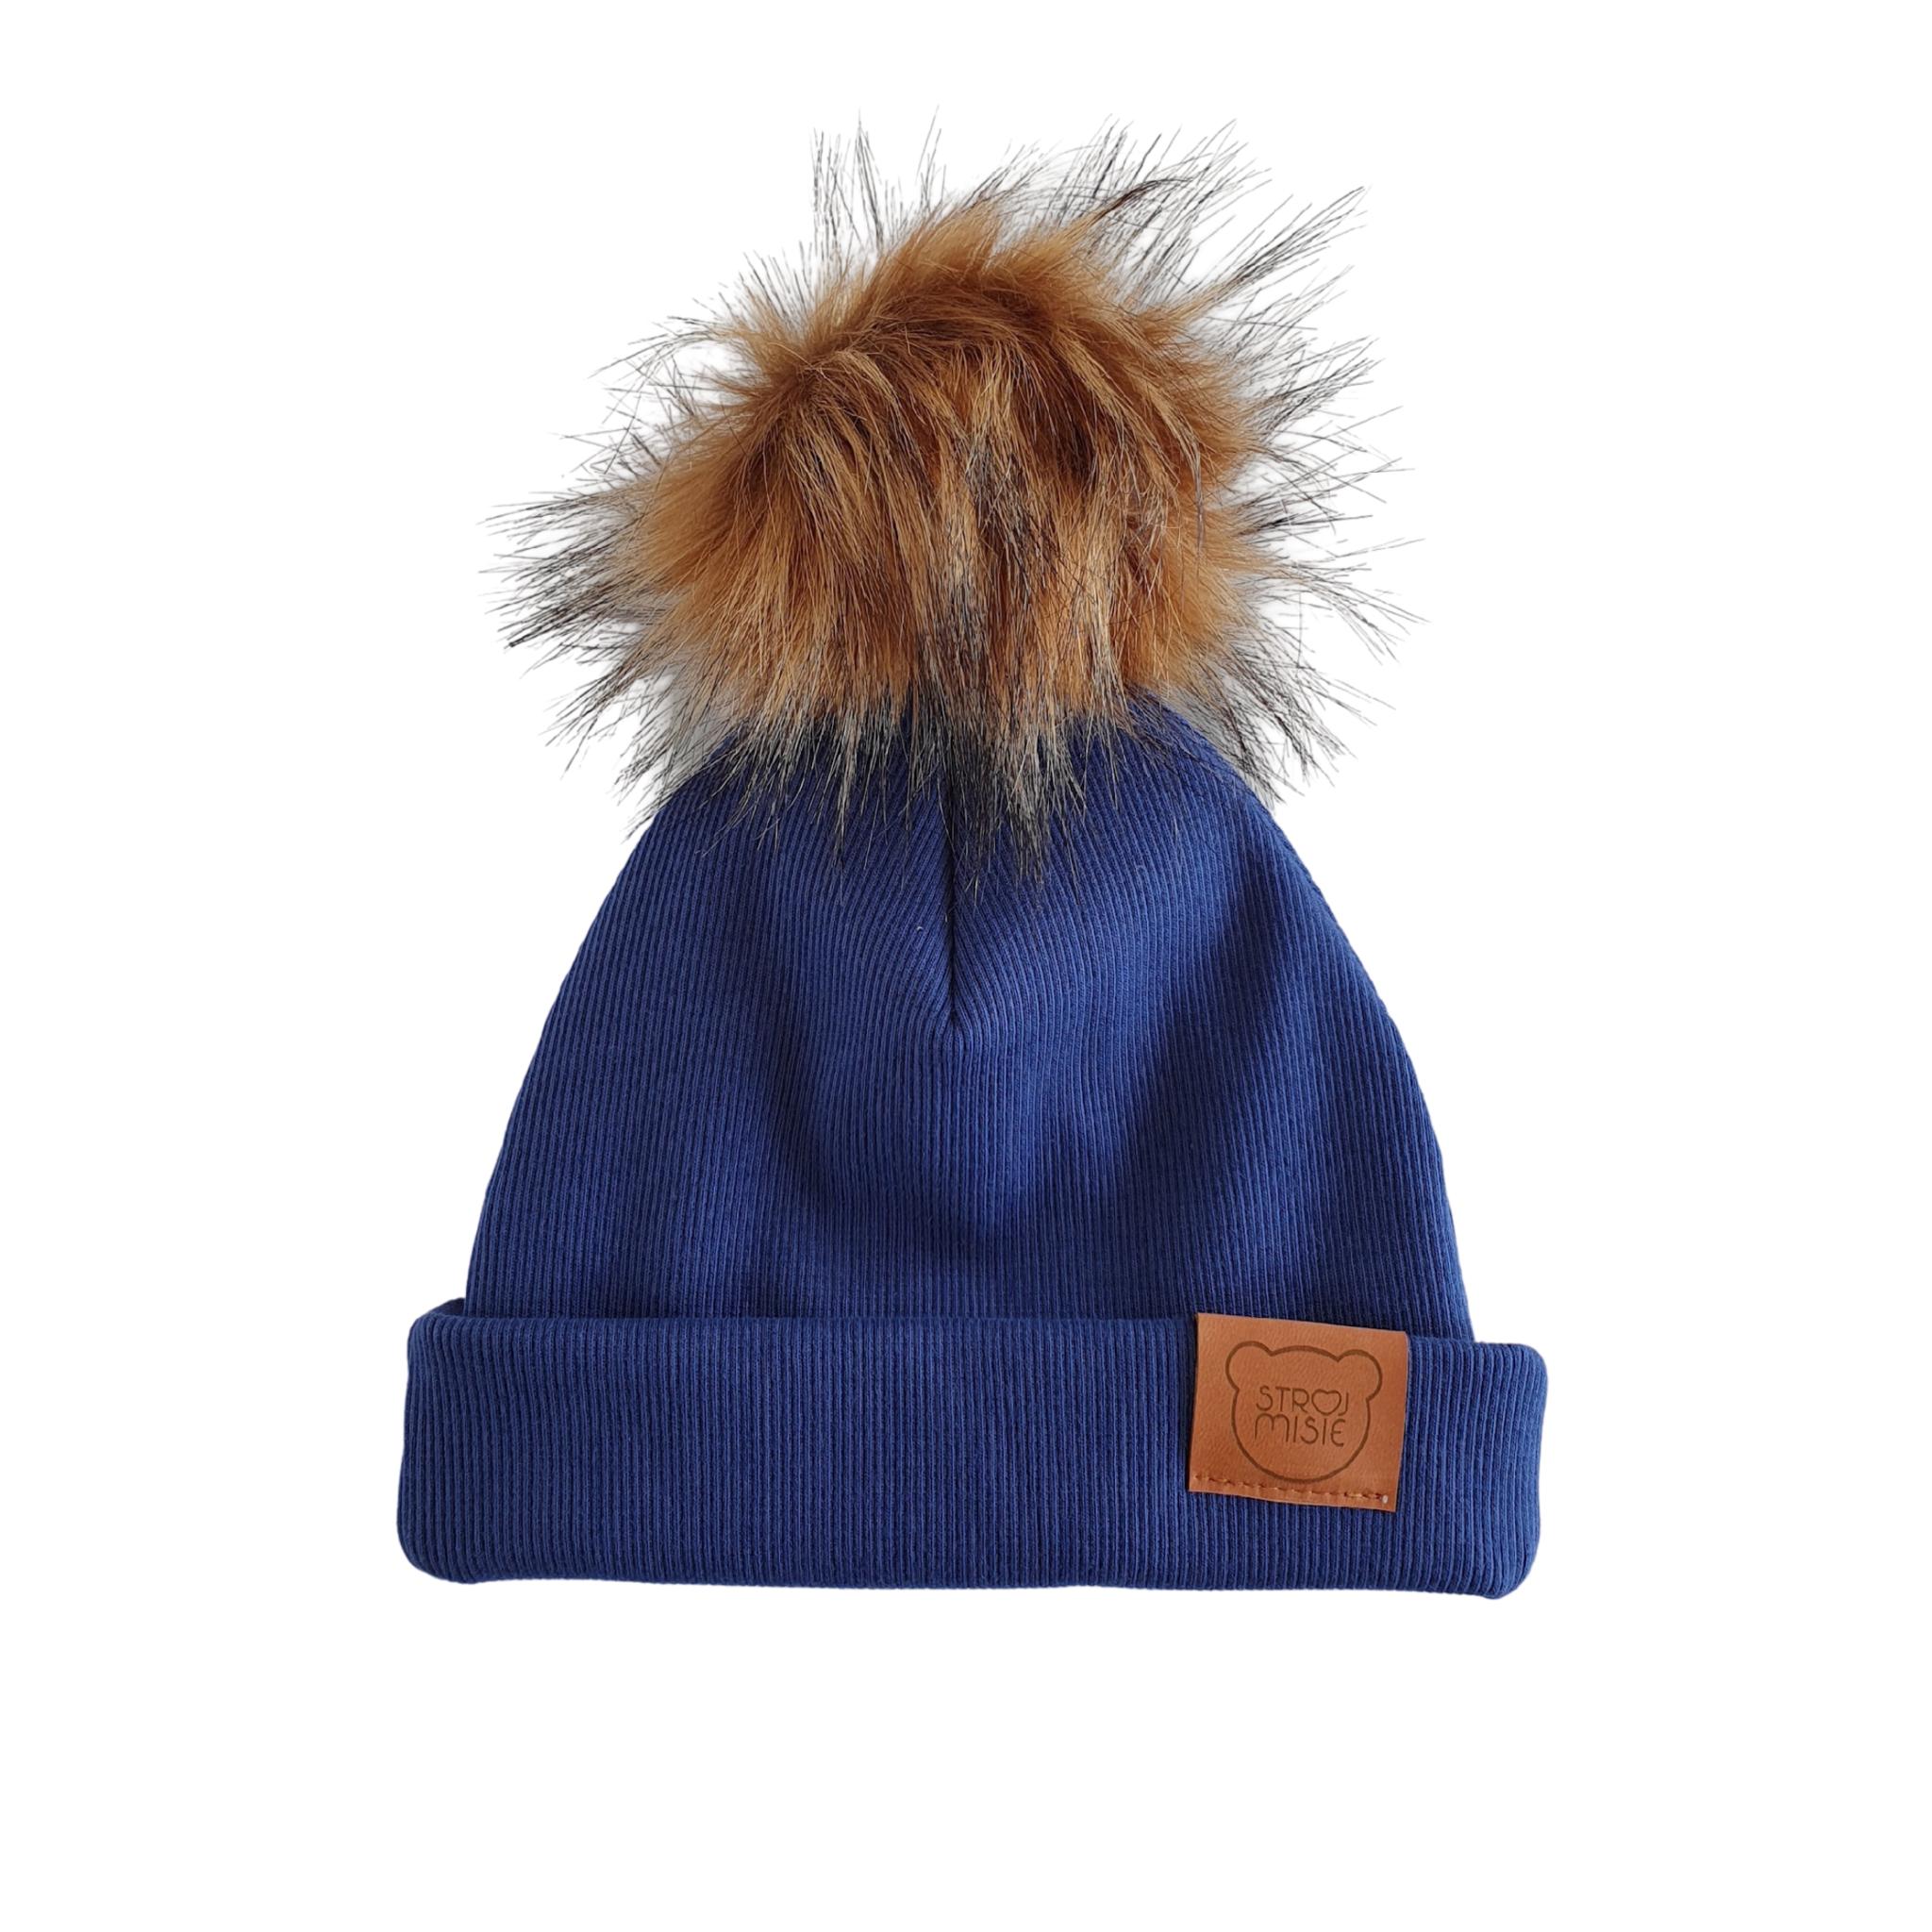 Strojmisie BLUE HAT WITH POM | KIDS HAT BLUE | BABY HAT NAVY